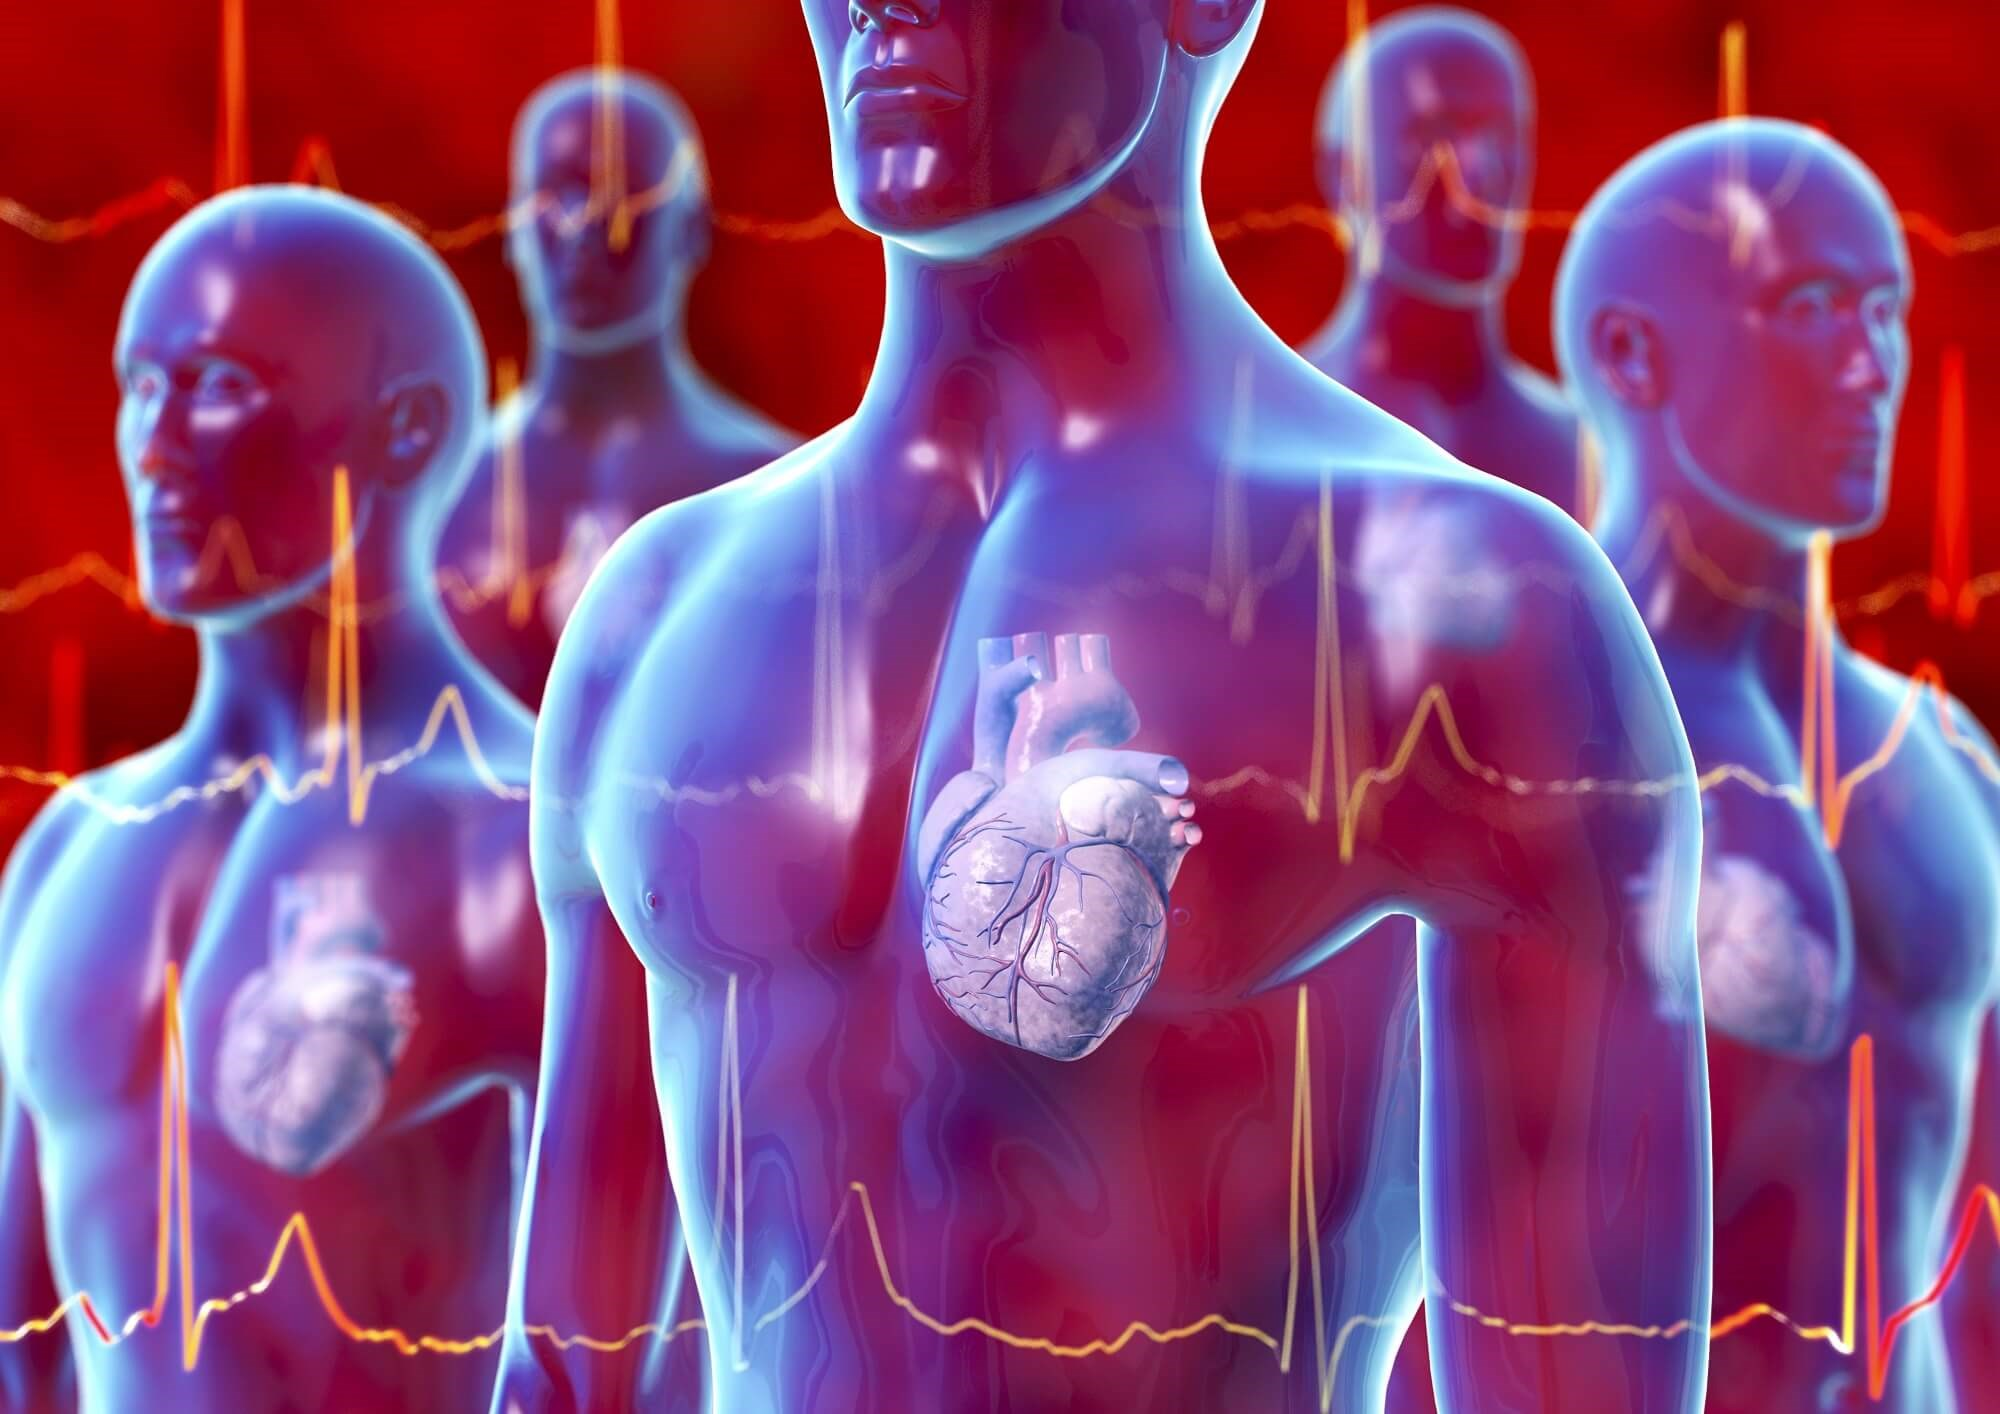 Rivaroxaban Has Positive Risk-Benefit Profile for Non-Valvular Atrial Fibrillation